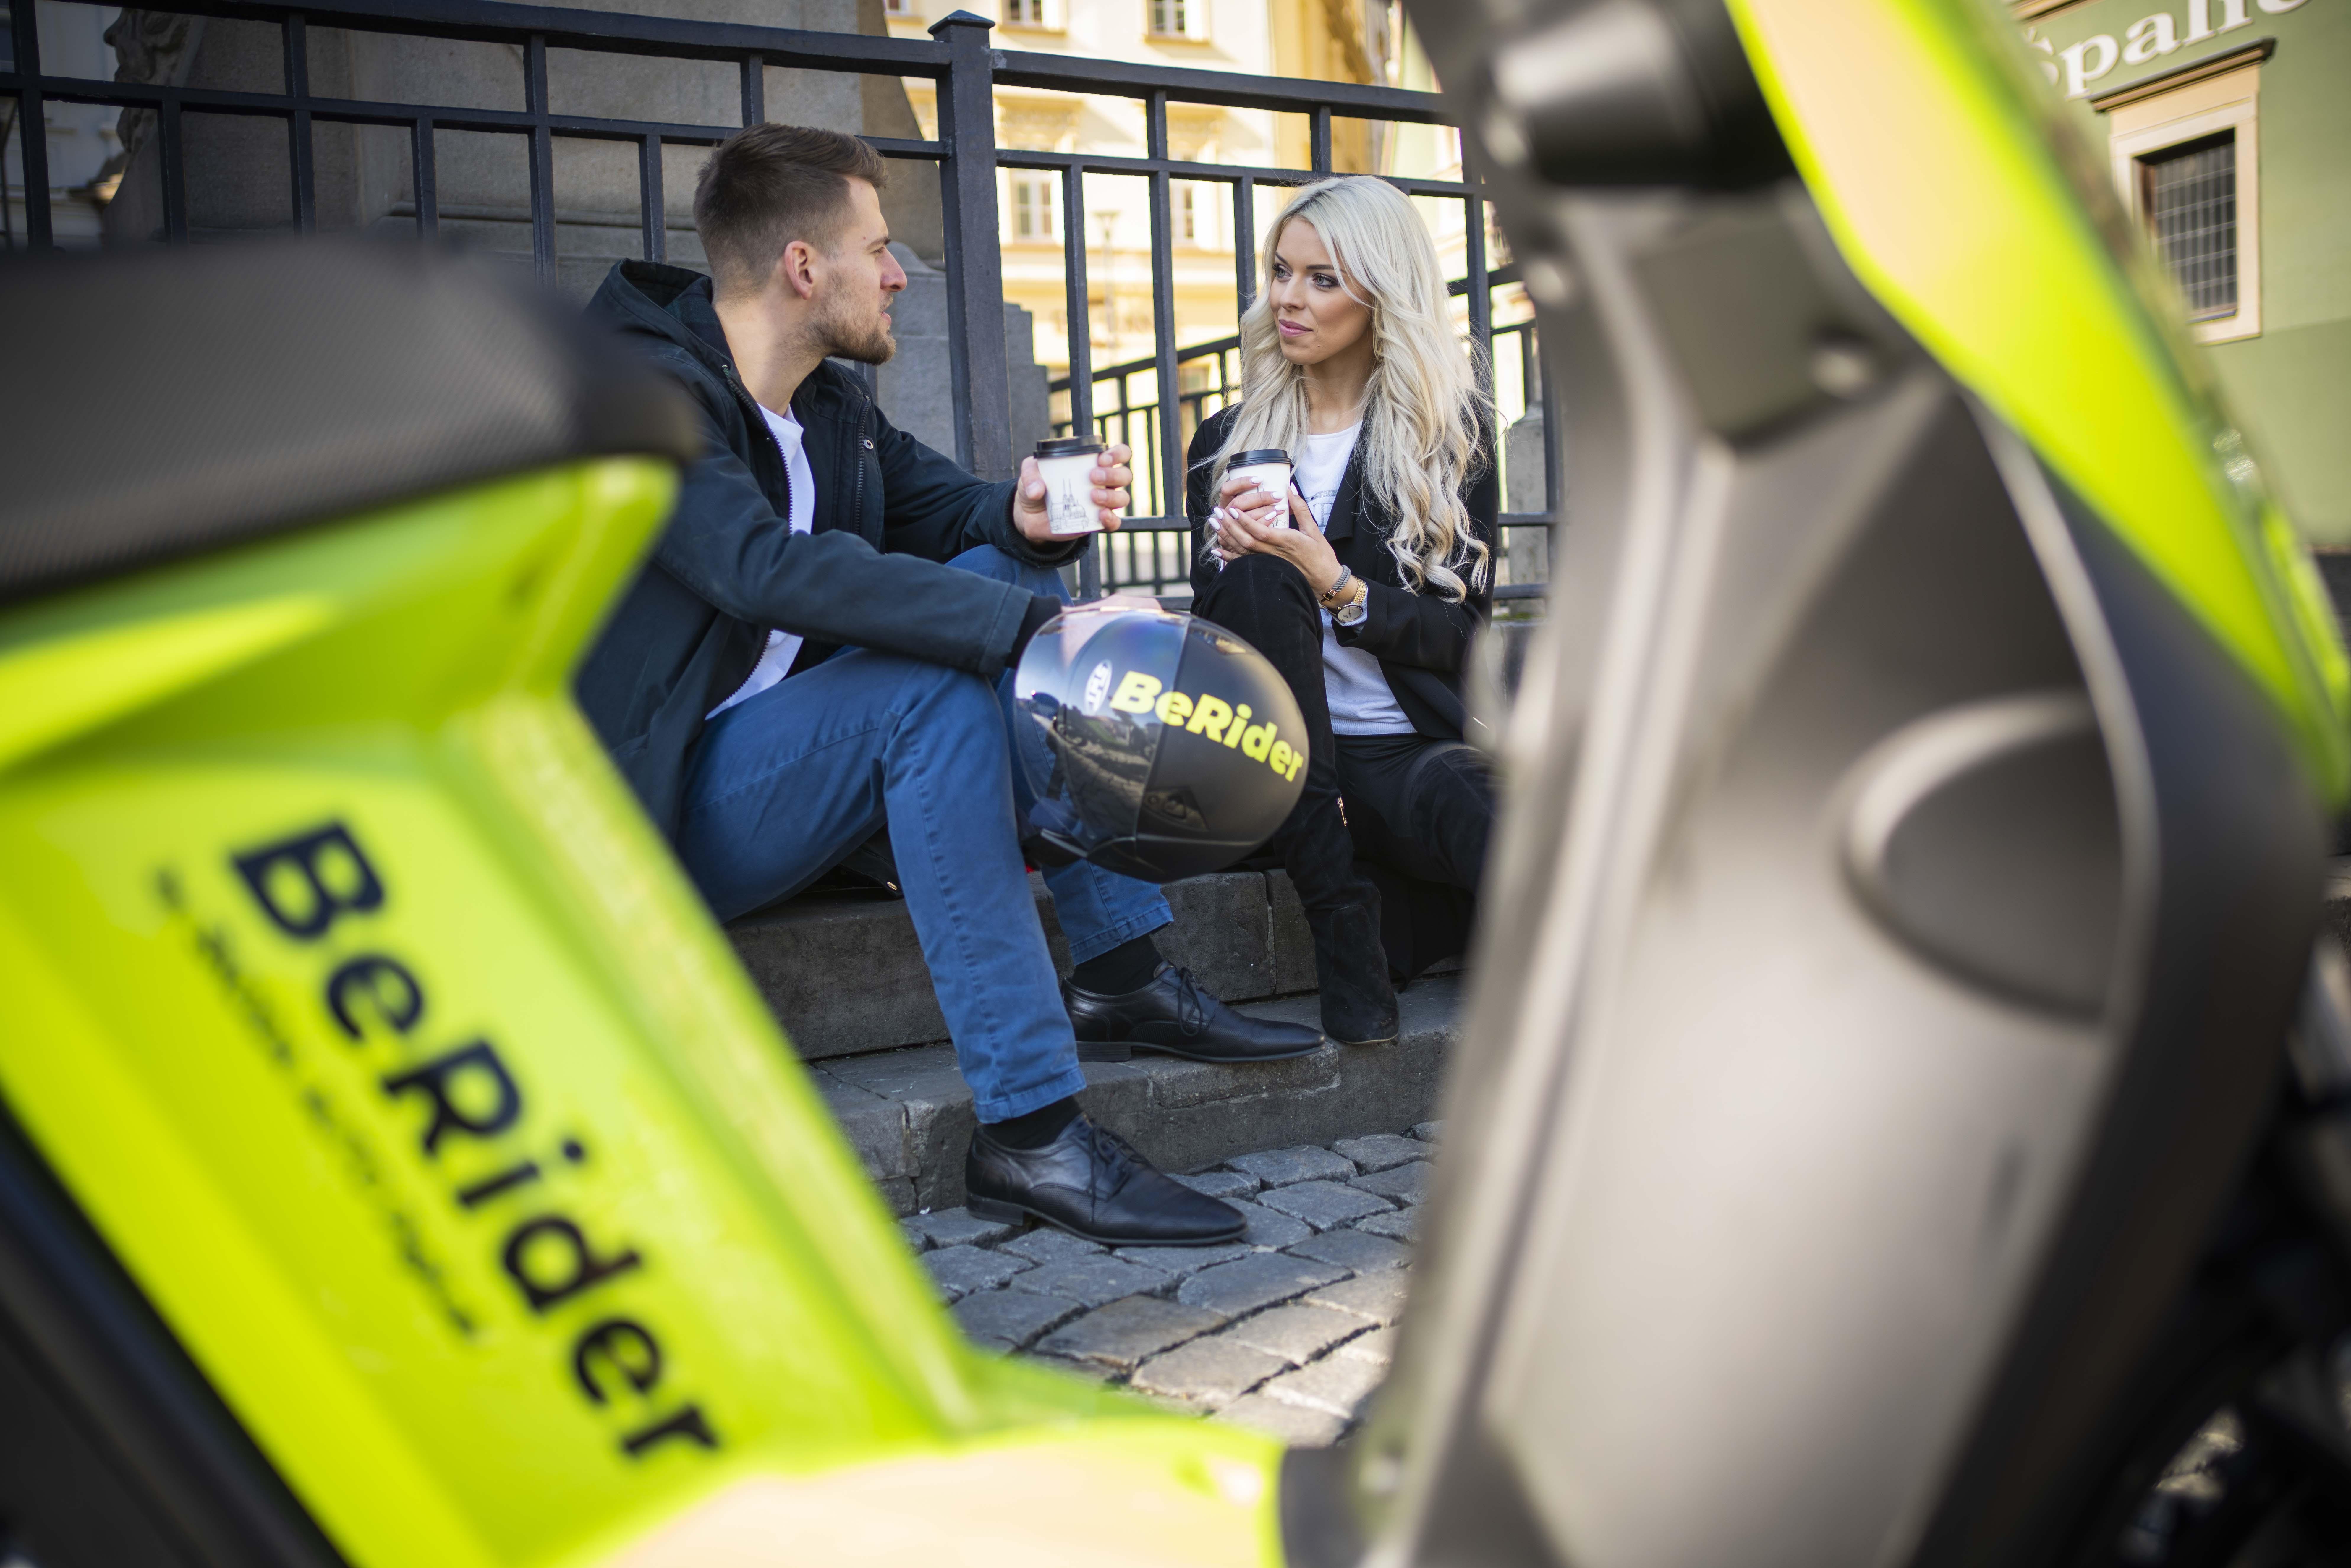 SKODA AUTO DigiLab brings BeRider e-scooter sharing to Brno - Image 1